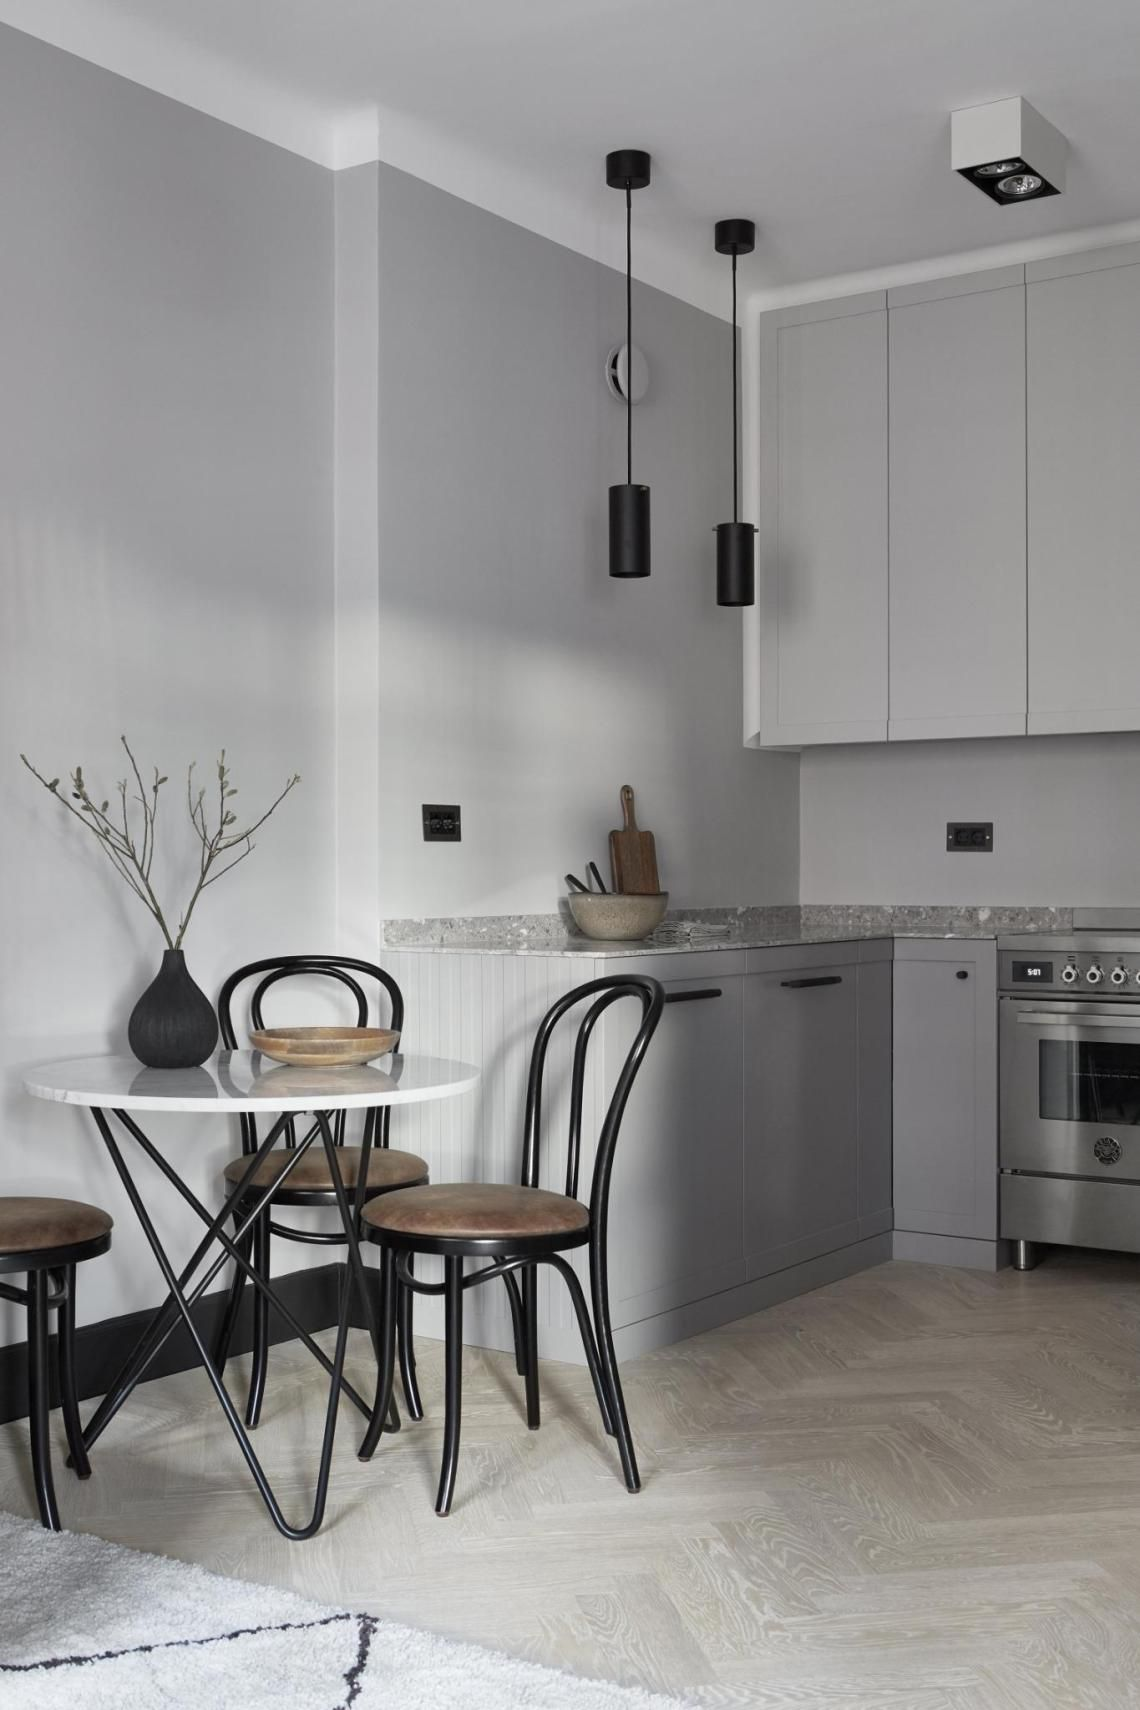 All grey kitchen - via Coco Lapine Design blog